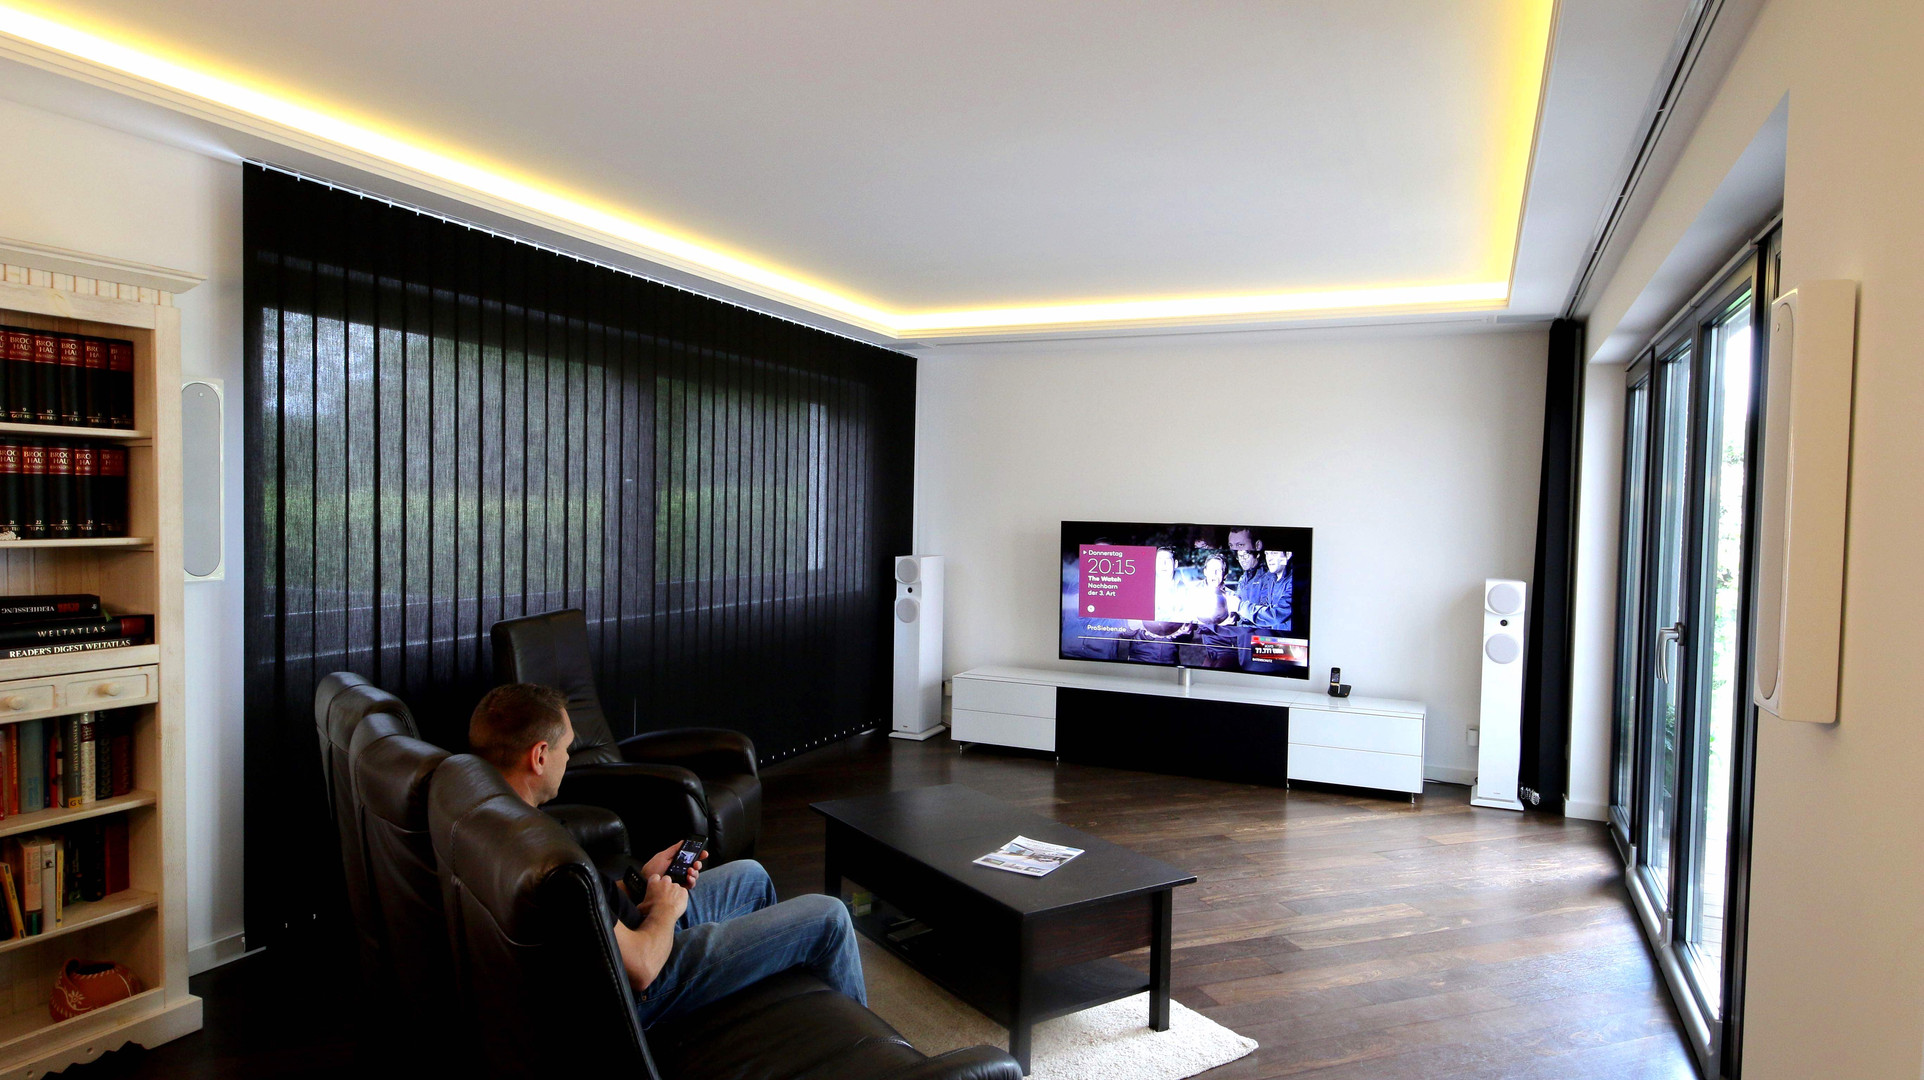 Heimkino All Inclusive-Kino-im-Wohnzimmer